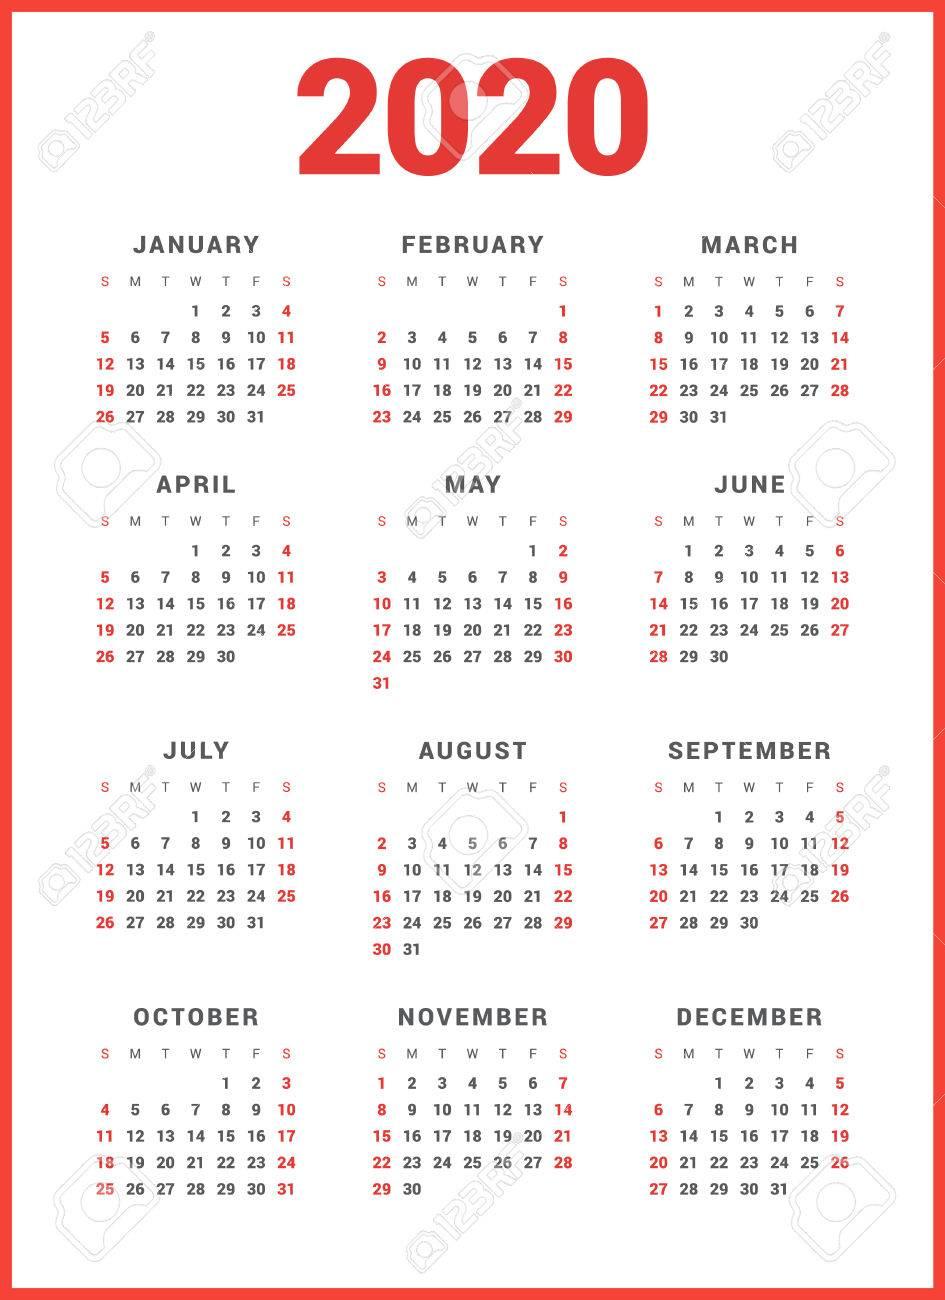 2020 Sunday Calendar Calendar For 2020 Year On White Background. Week Starts Sunday